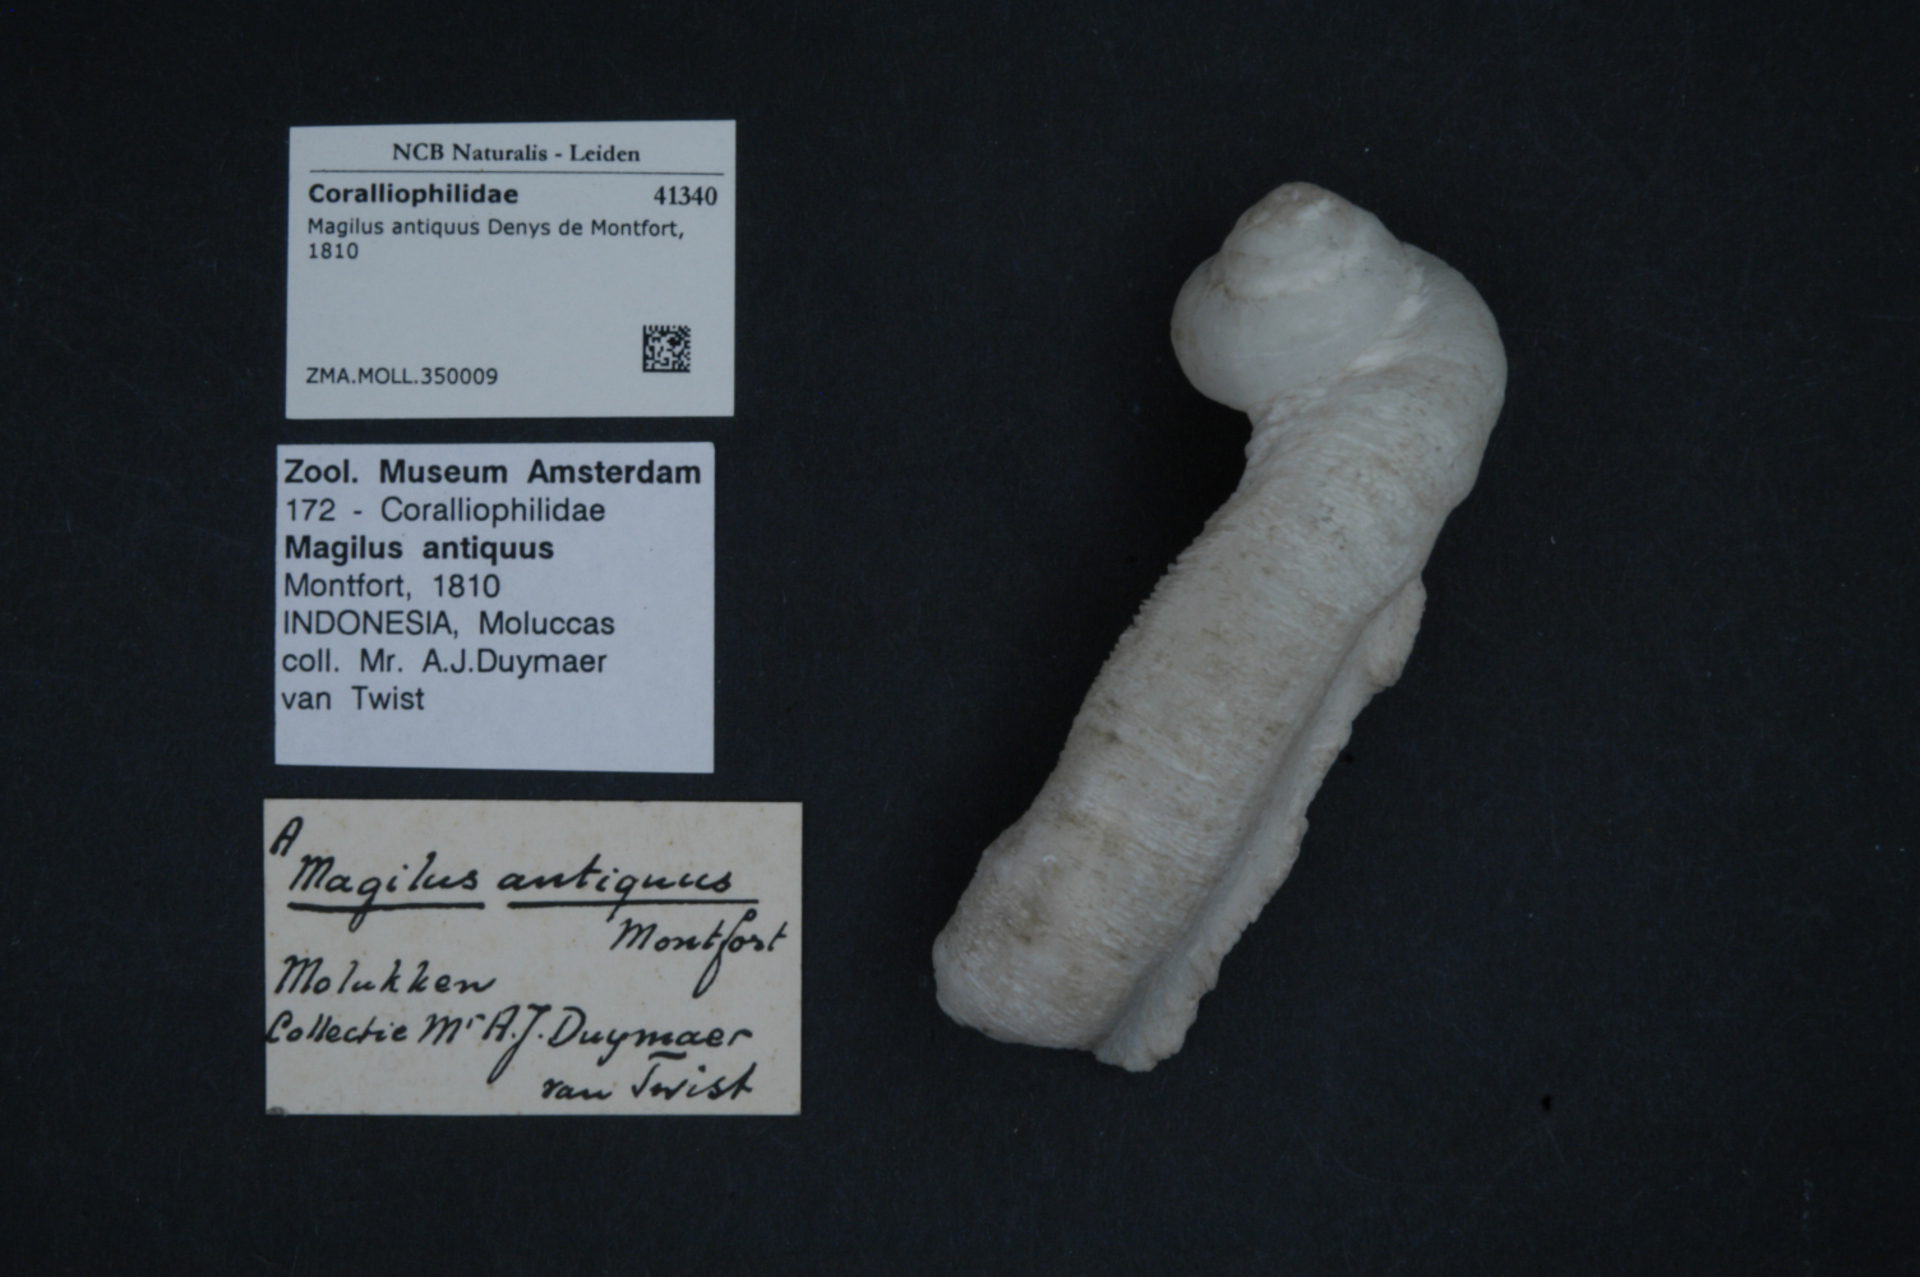 ZMA.MOLL.350009   Magilus antiquus Denys de Montfort, 1810